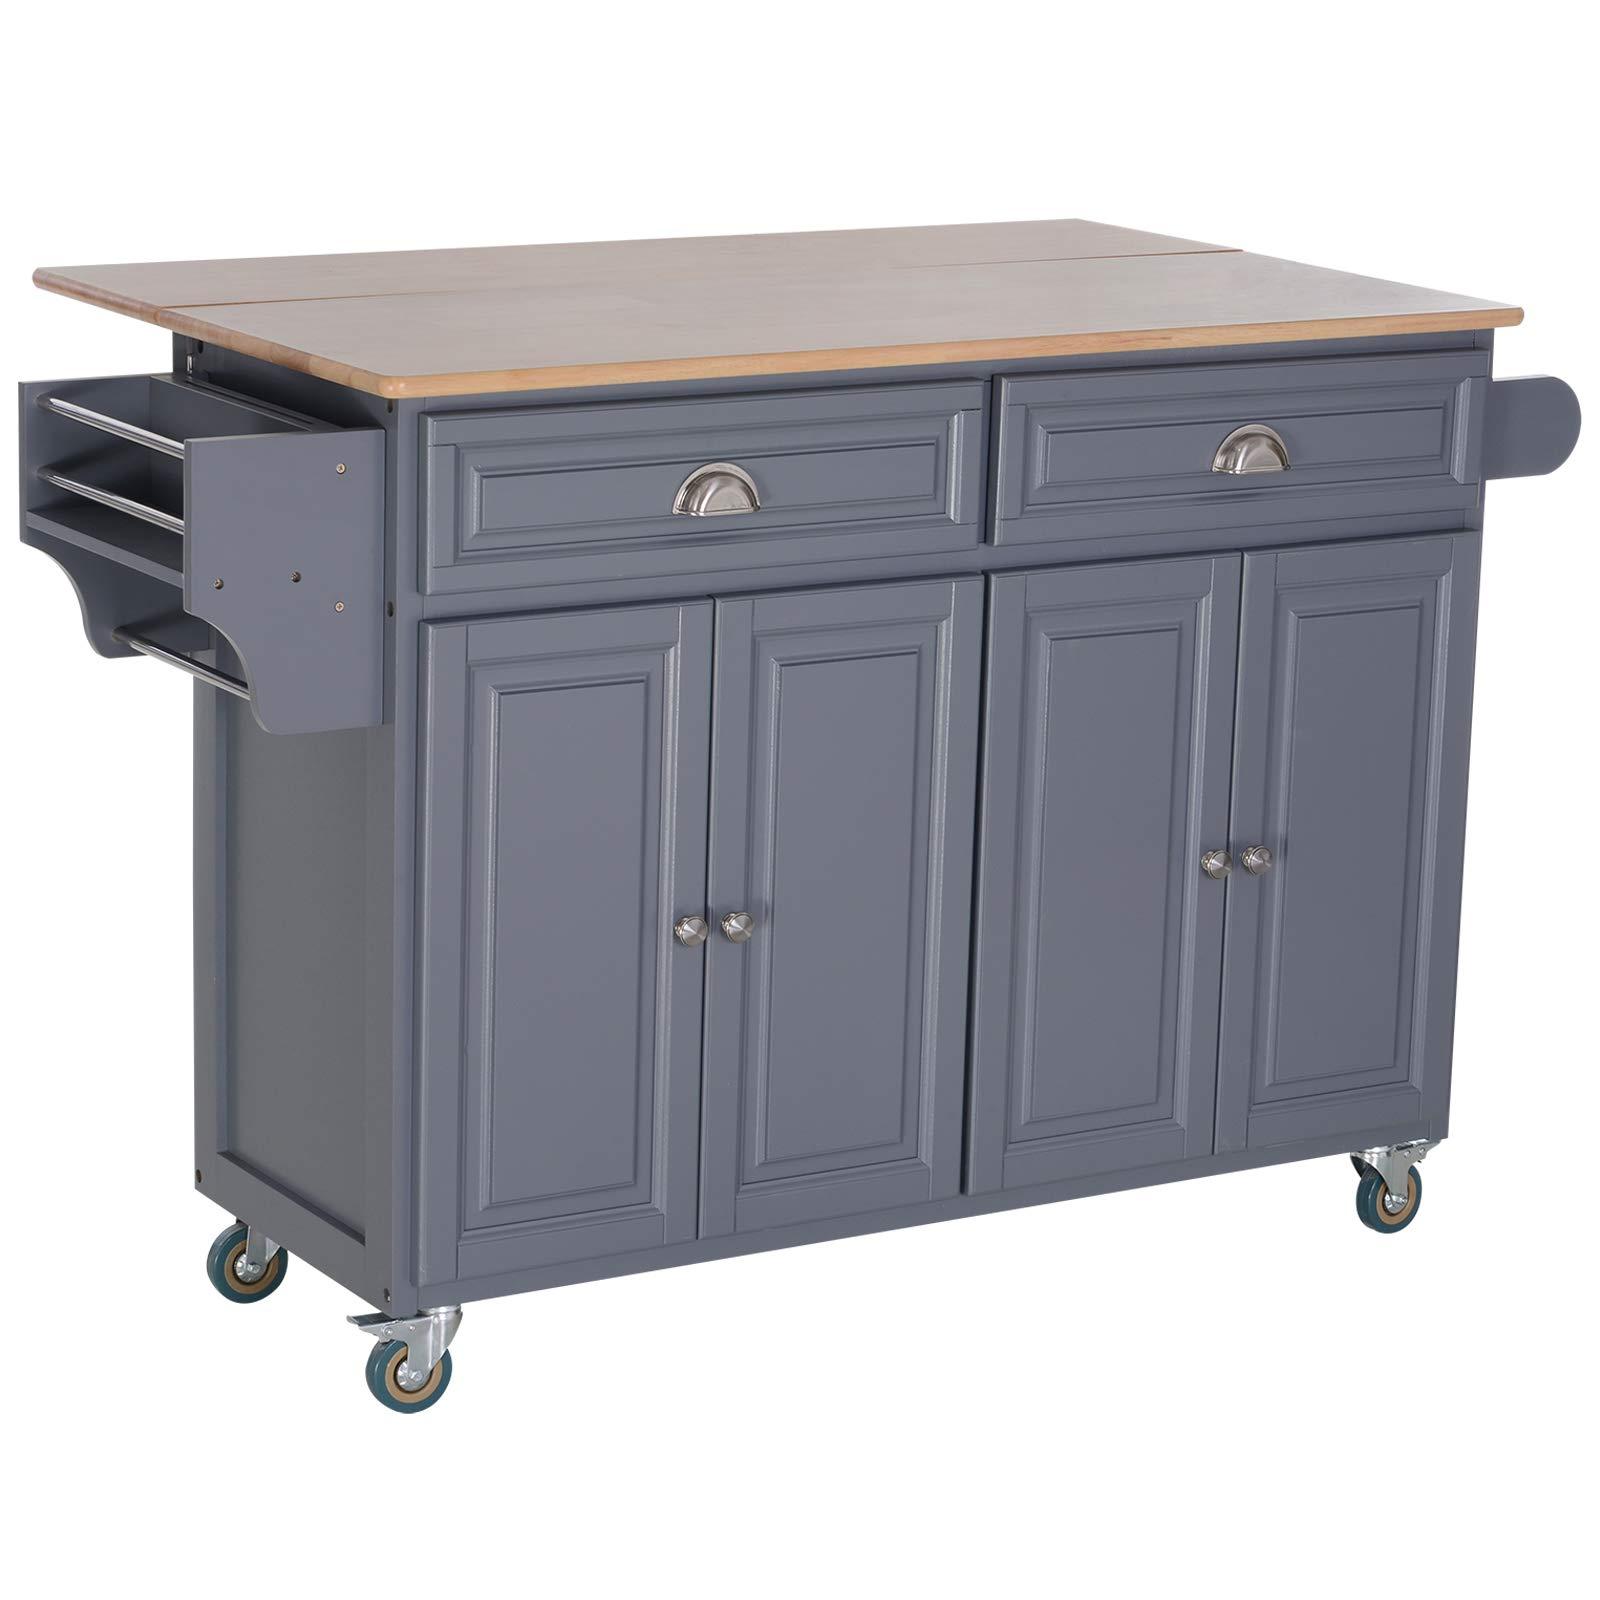 HOMCOM Rolling Oak Wood Drop-Leaf Kitchen Island Cart with Storage and Butcher Block - Grey by HOMCOM